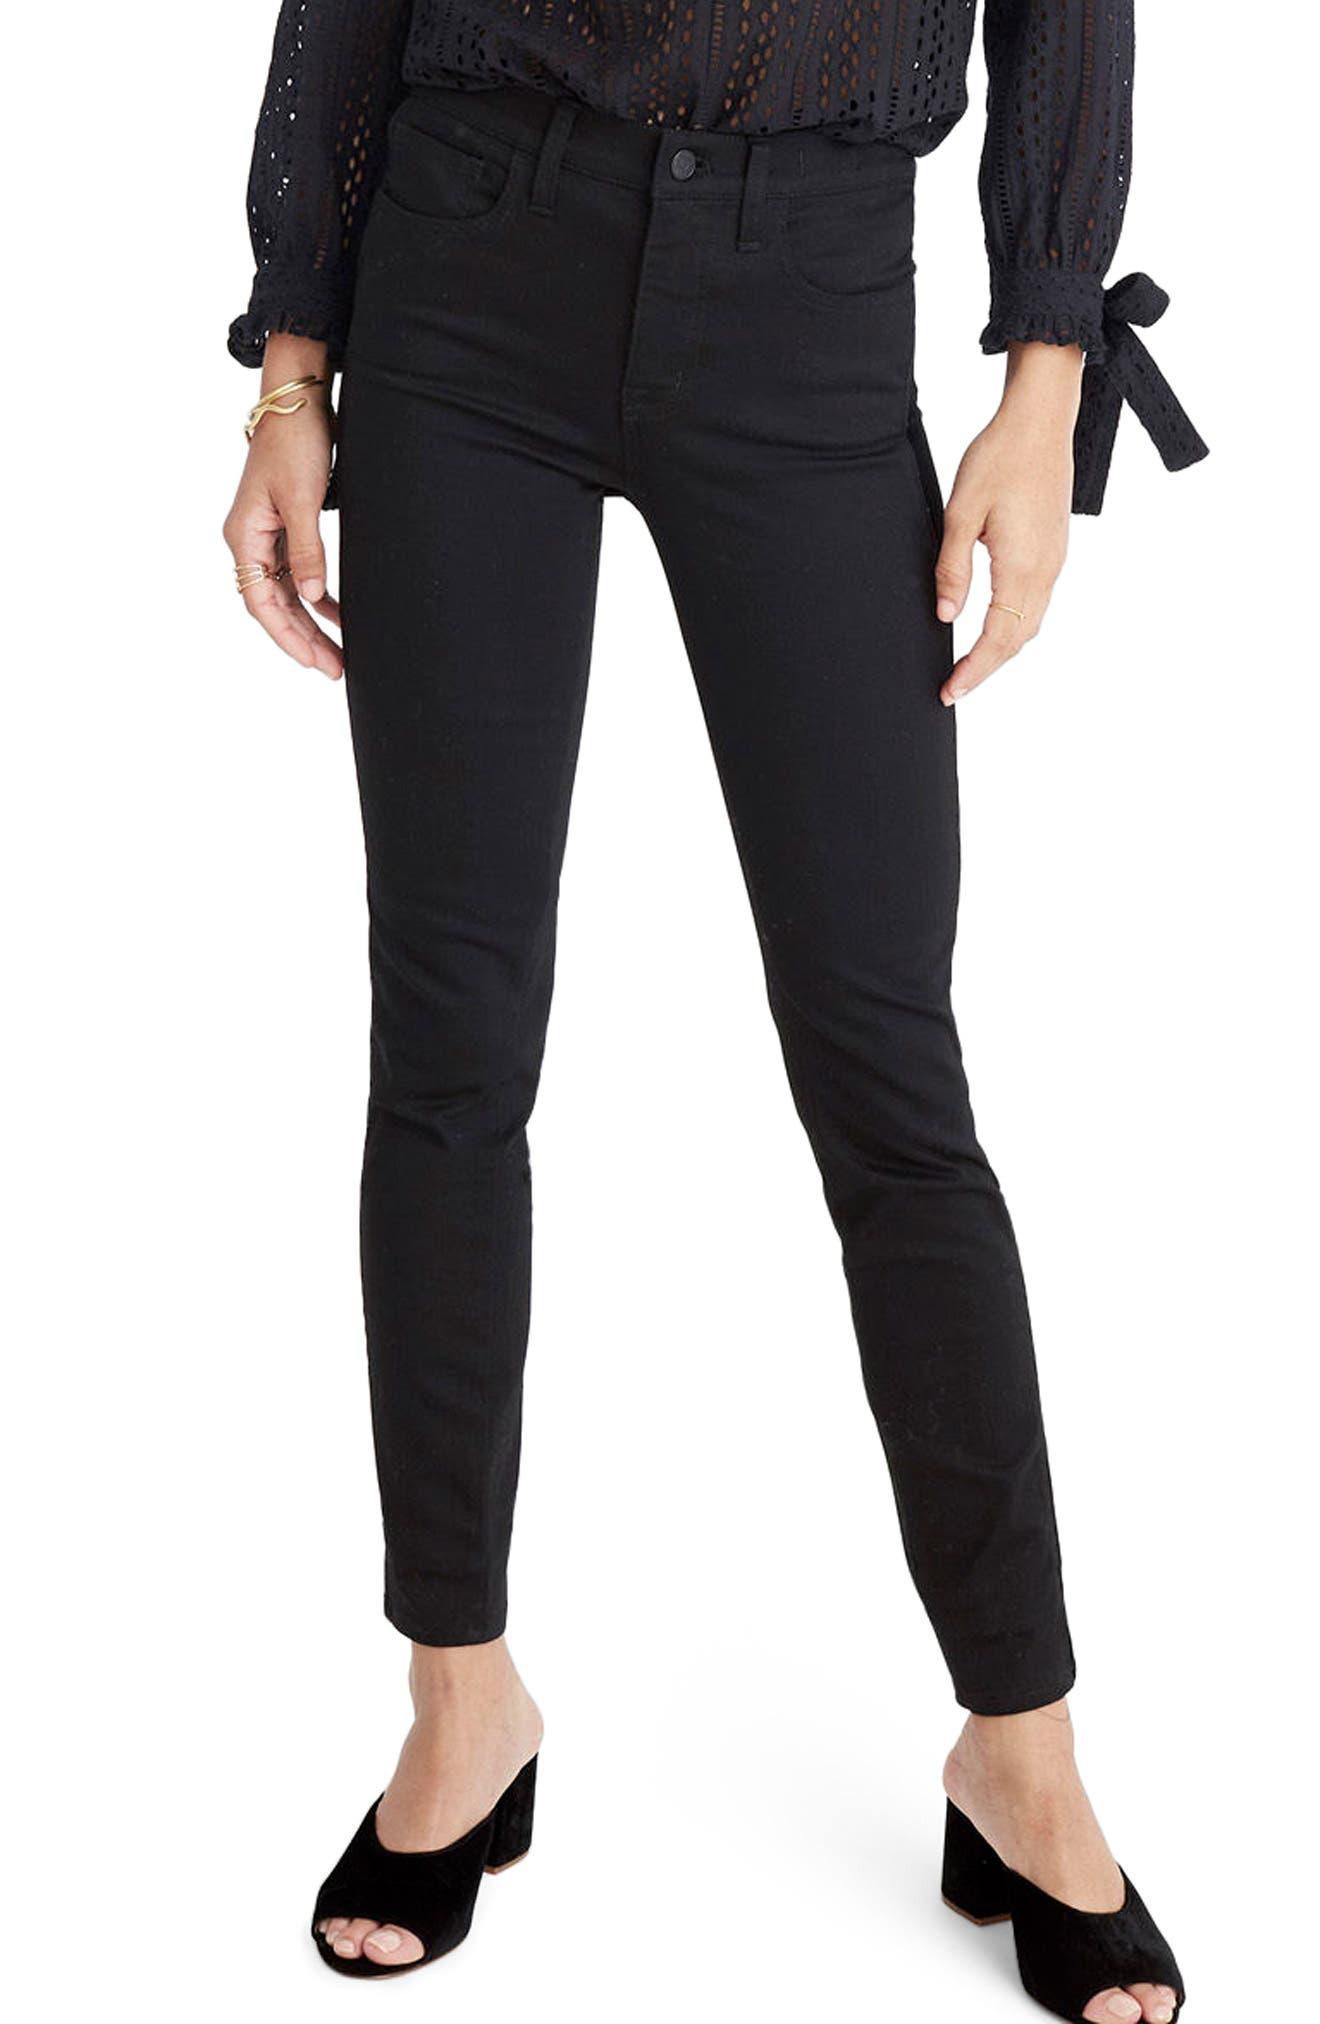 9-Inch High Waist Tuxedo Stripe Skinny Jeans,                             Main thumbnail 1, color,                             009